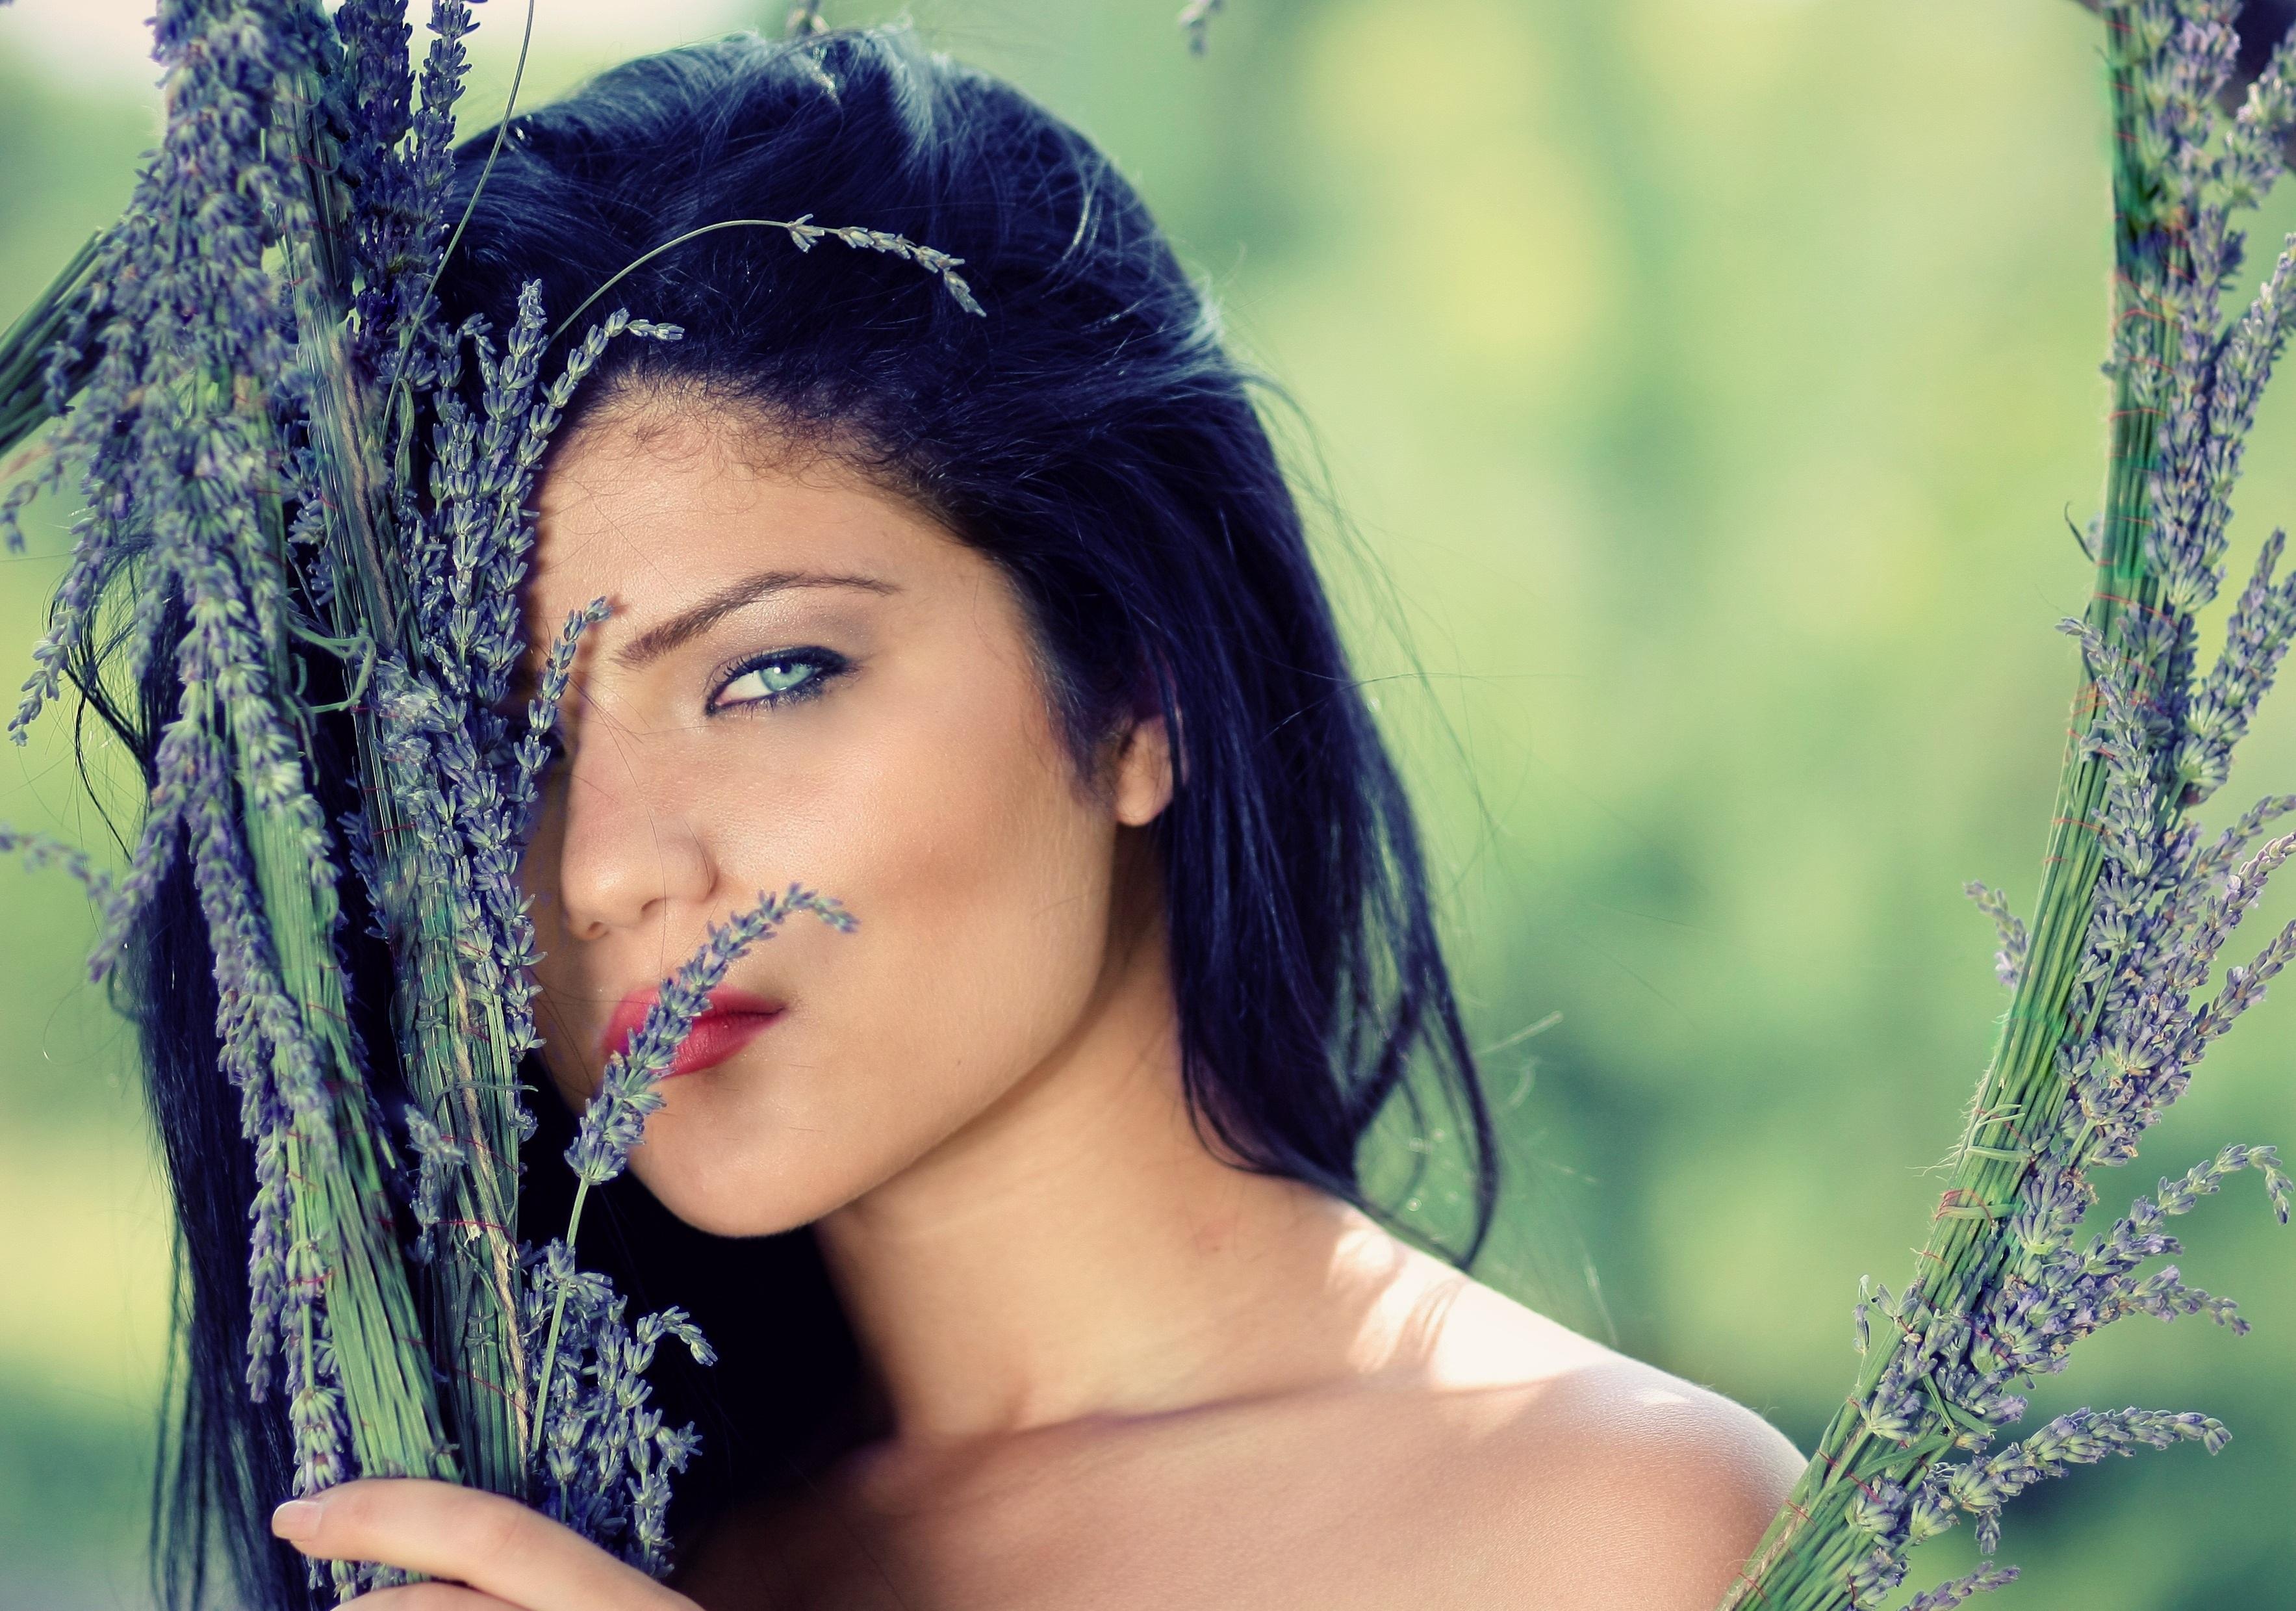 Фото красивых девушек брюнеток с цветами в волосах на пляже — pic 6